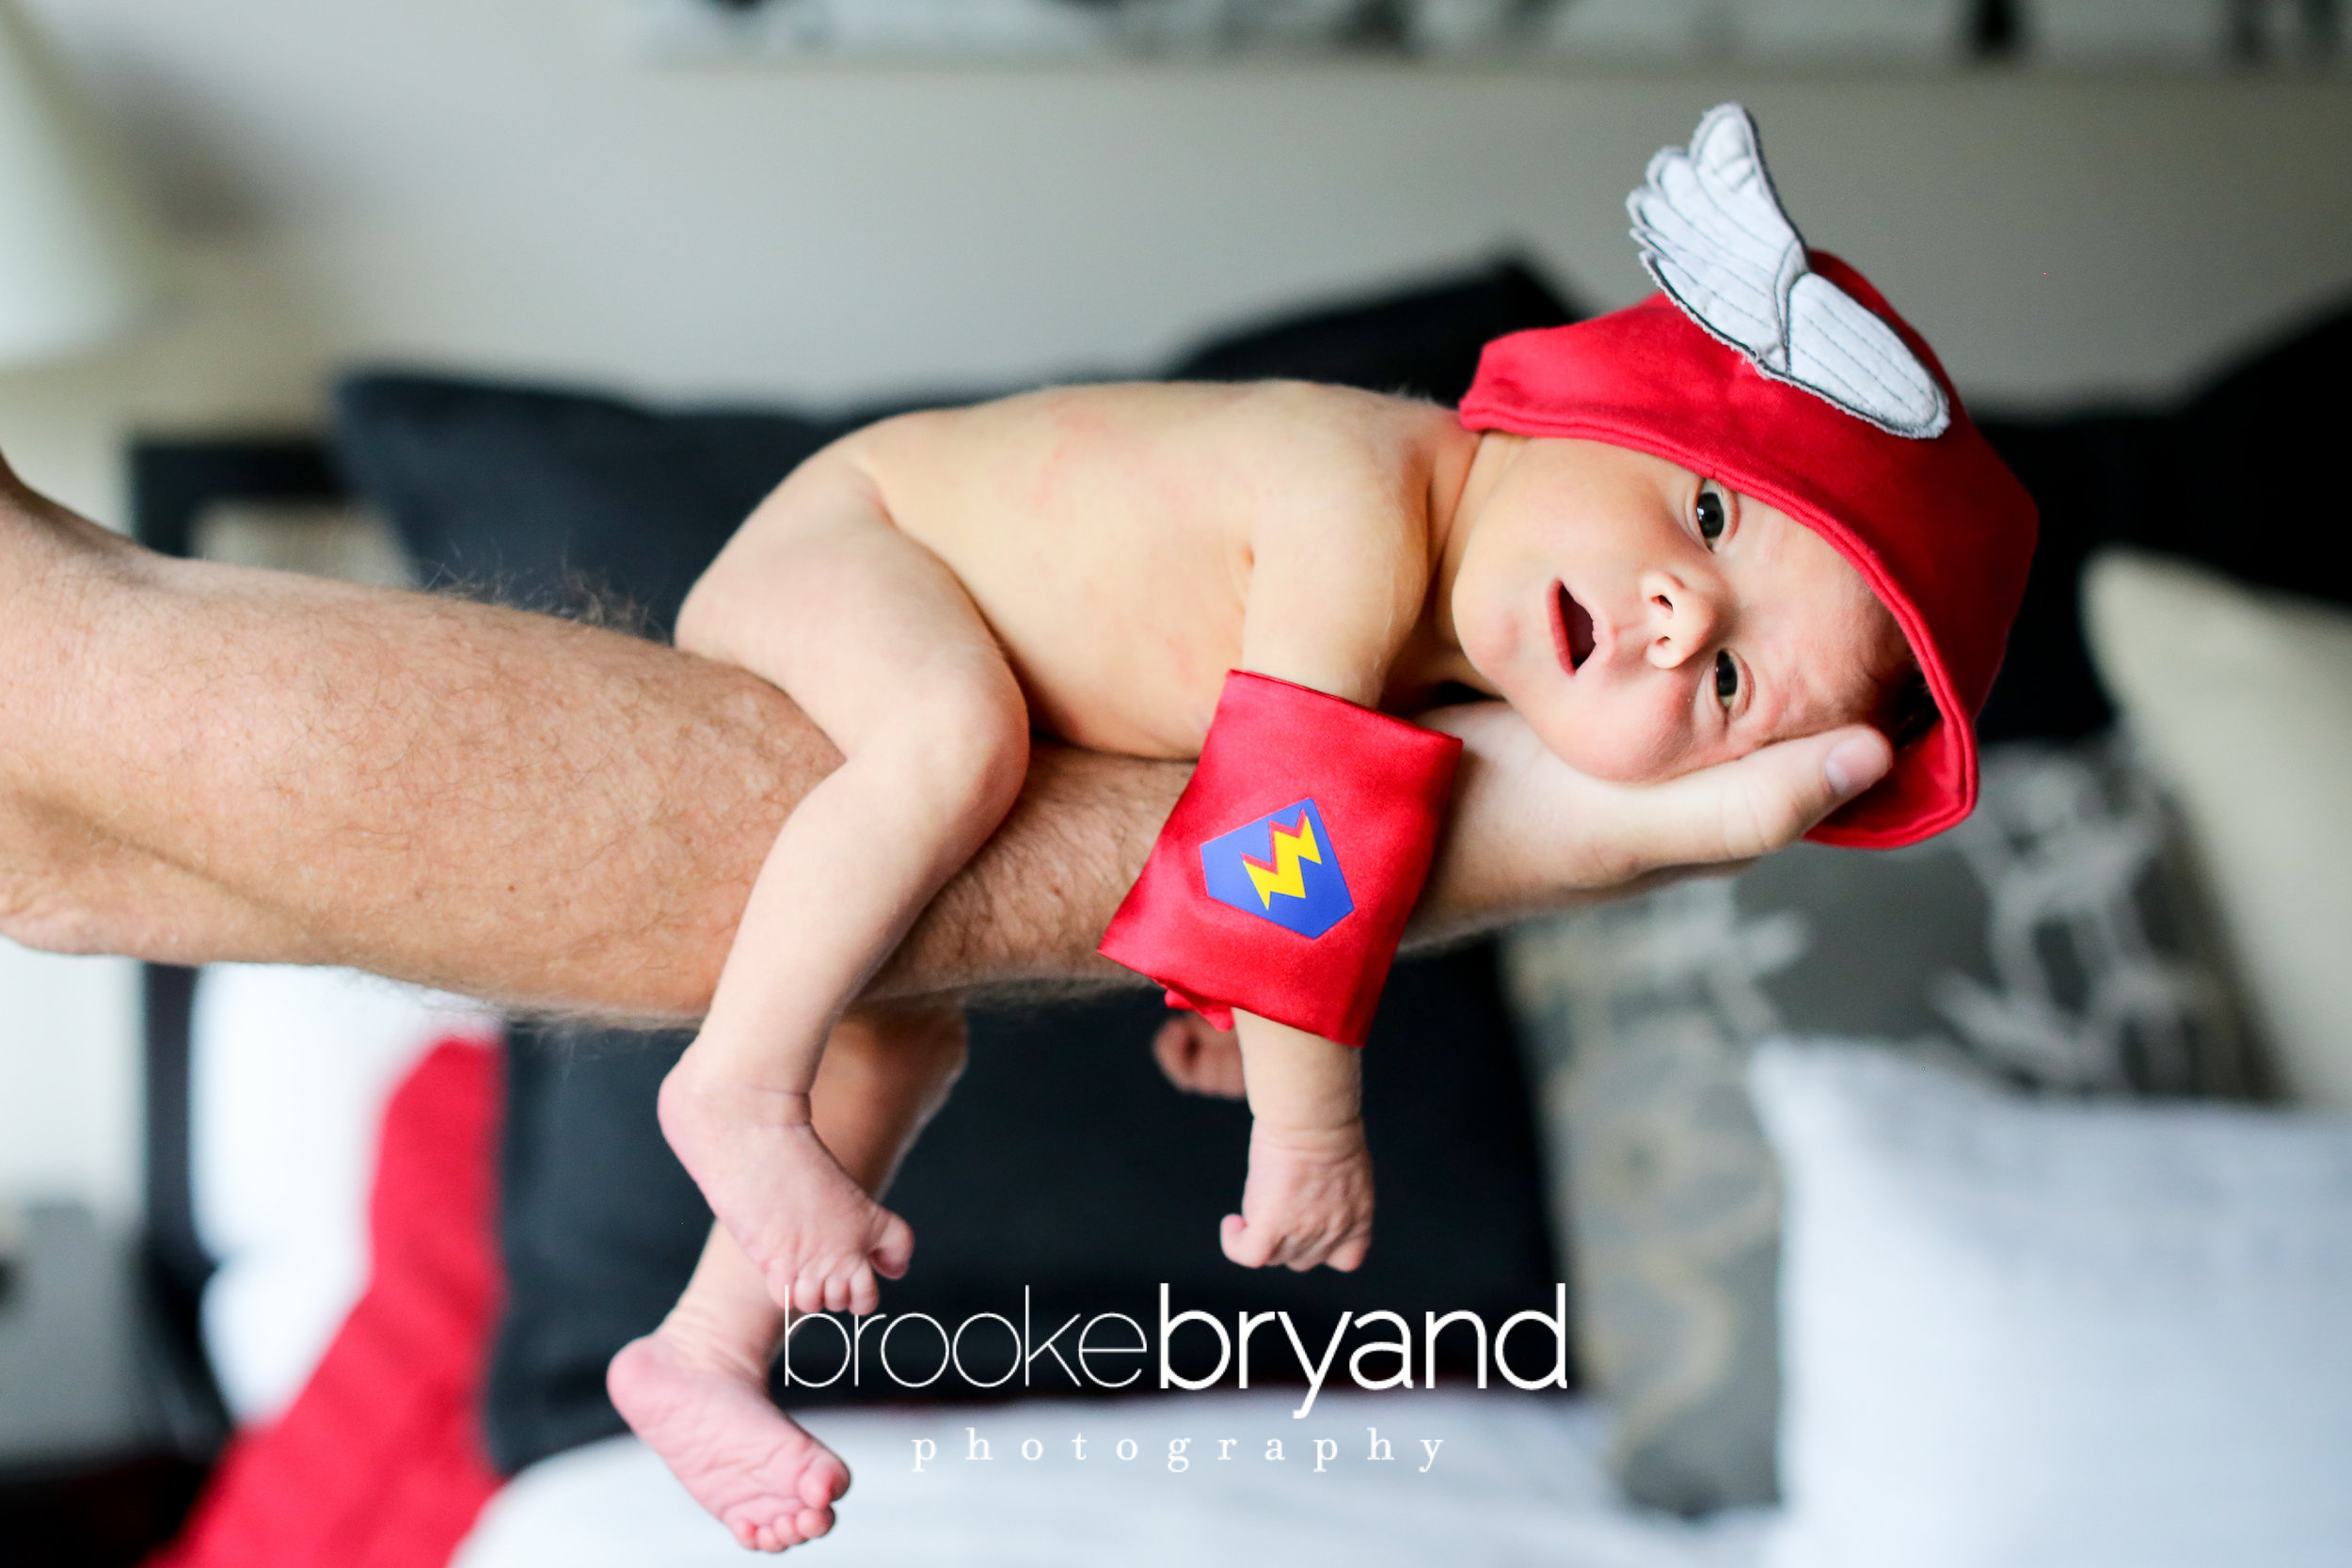 Brooke-Bryand-Photography-San-Francisco-Newborn-Photographer-IMG_9381.jpg